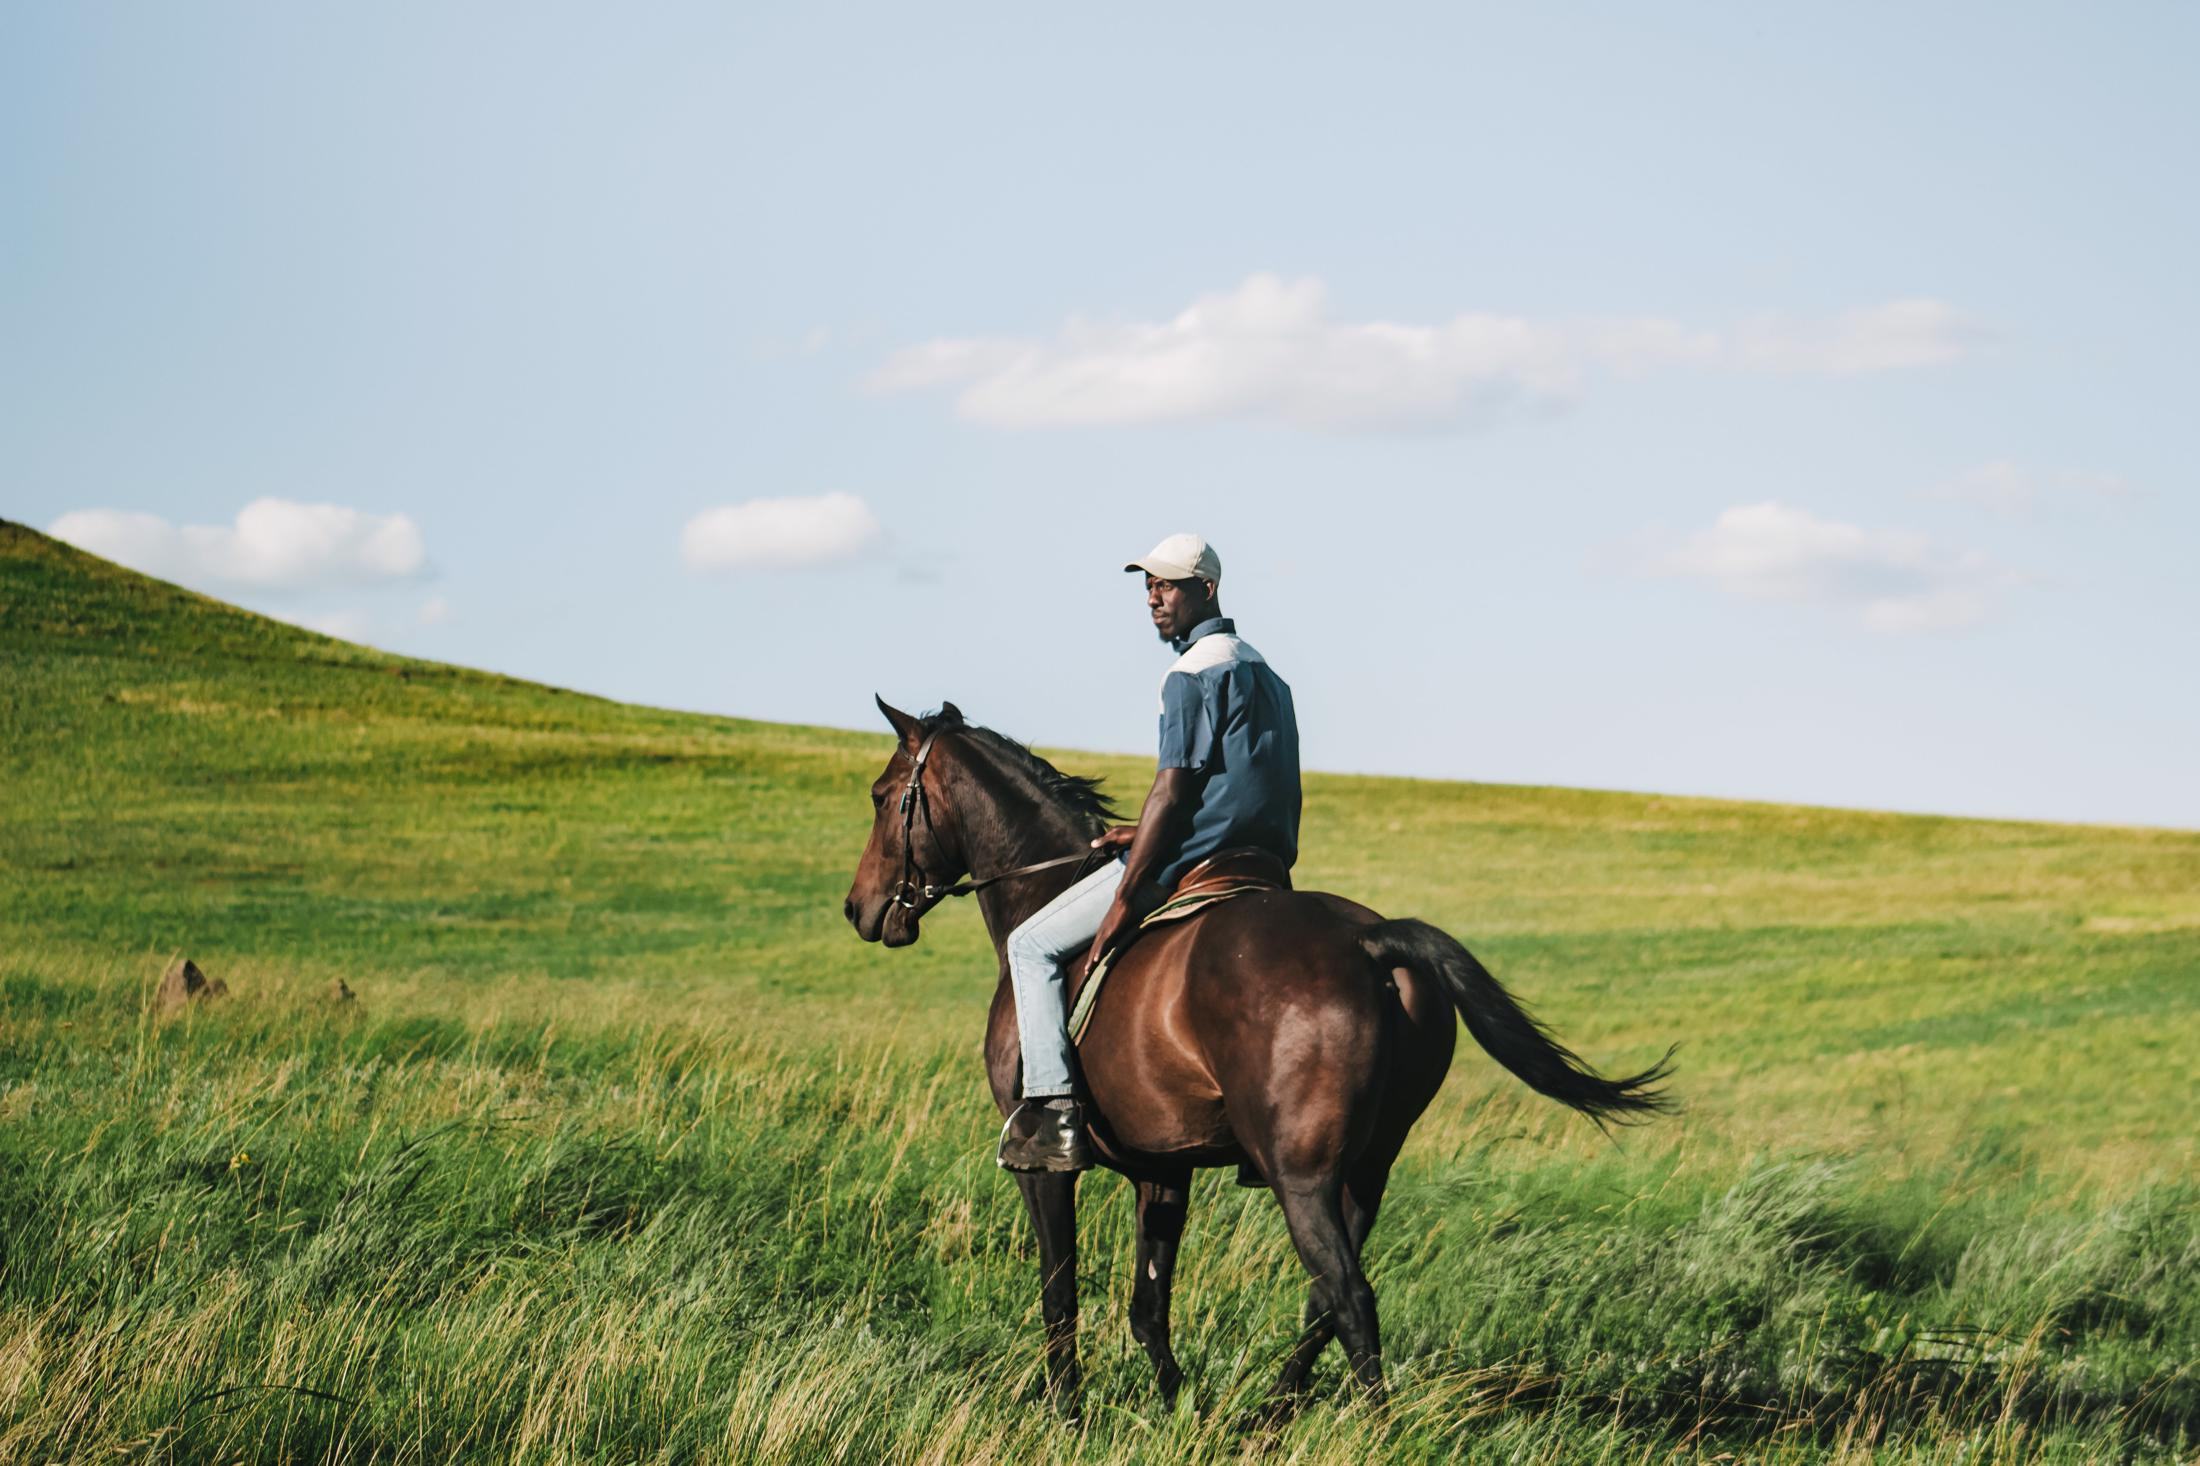 Paarden safari Afrika - Zulu gids op paard in de Drakensbergen (Northern Horse Montusi)